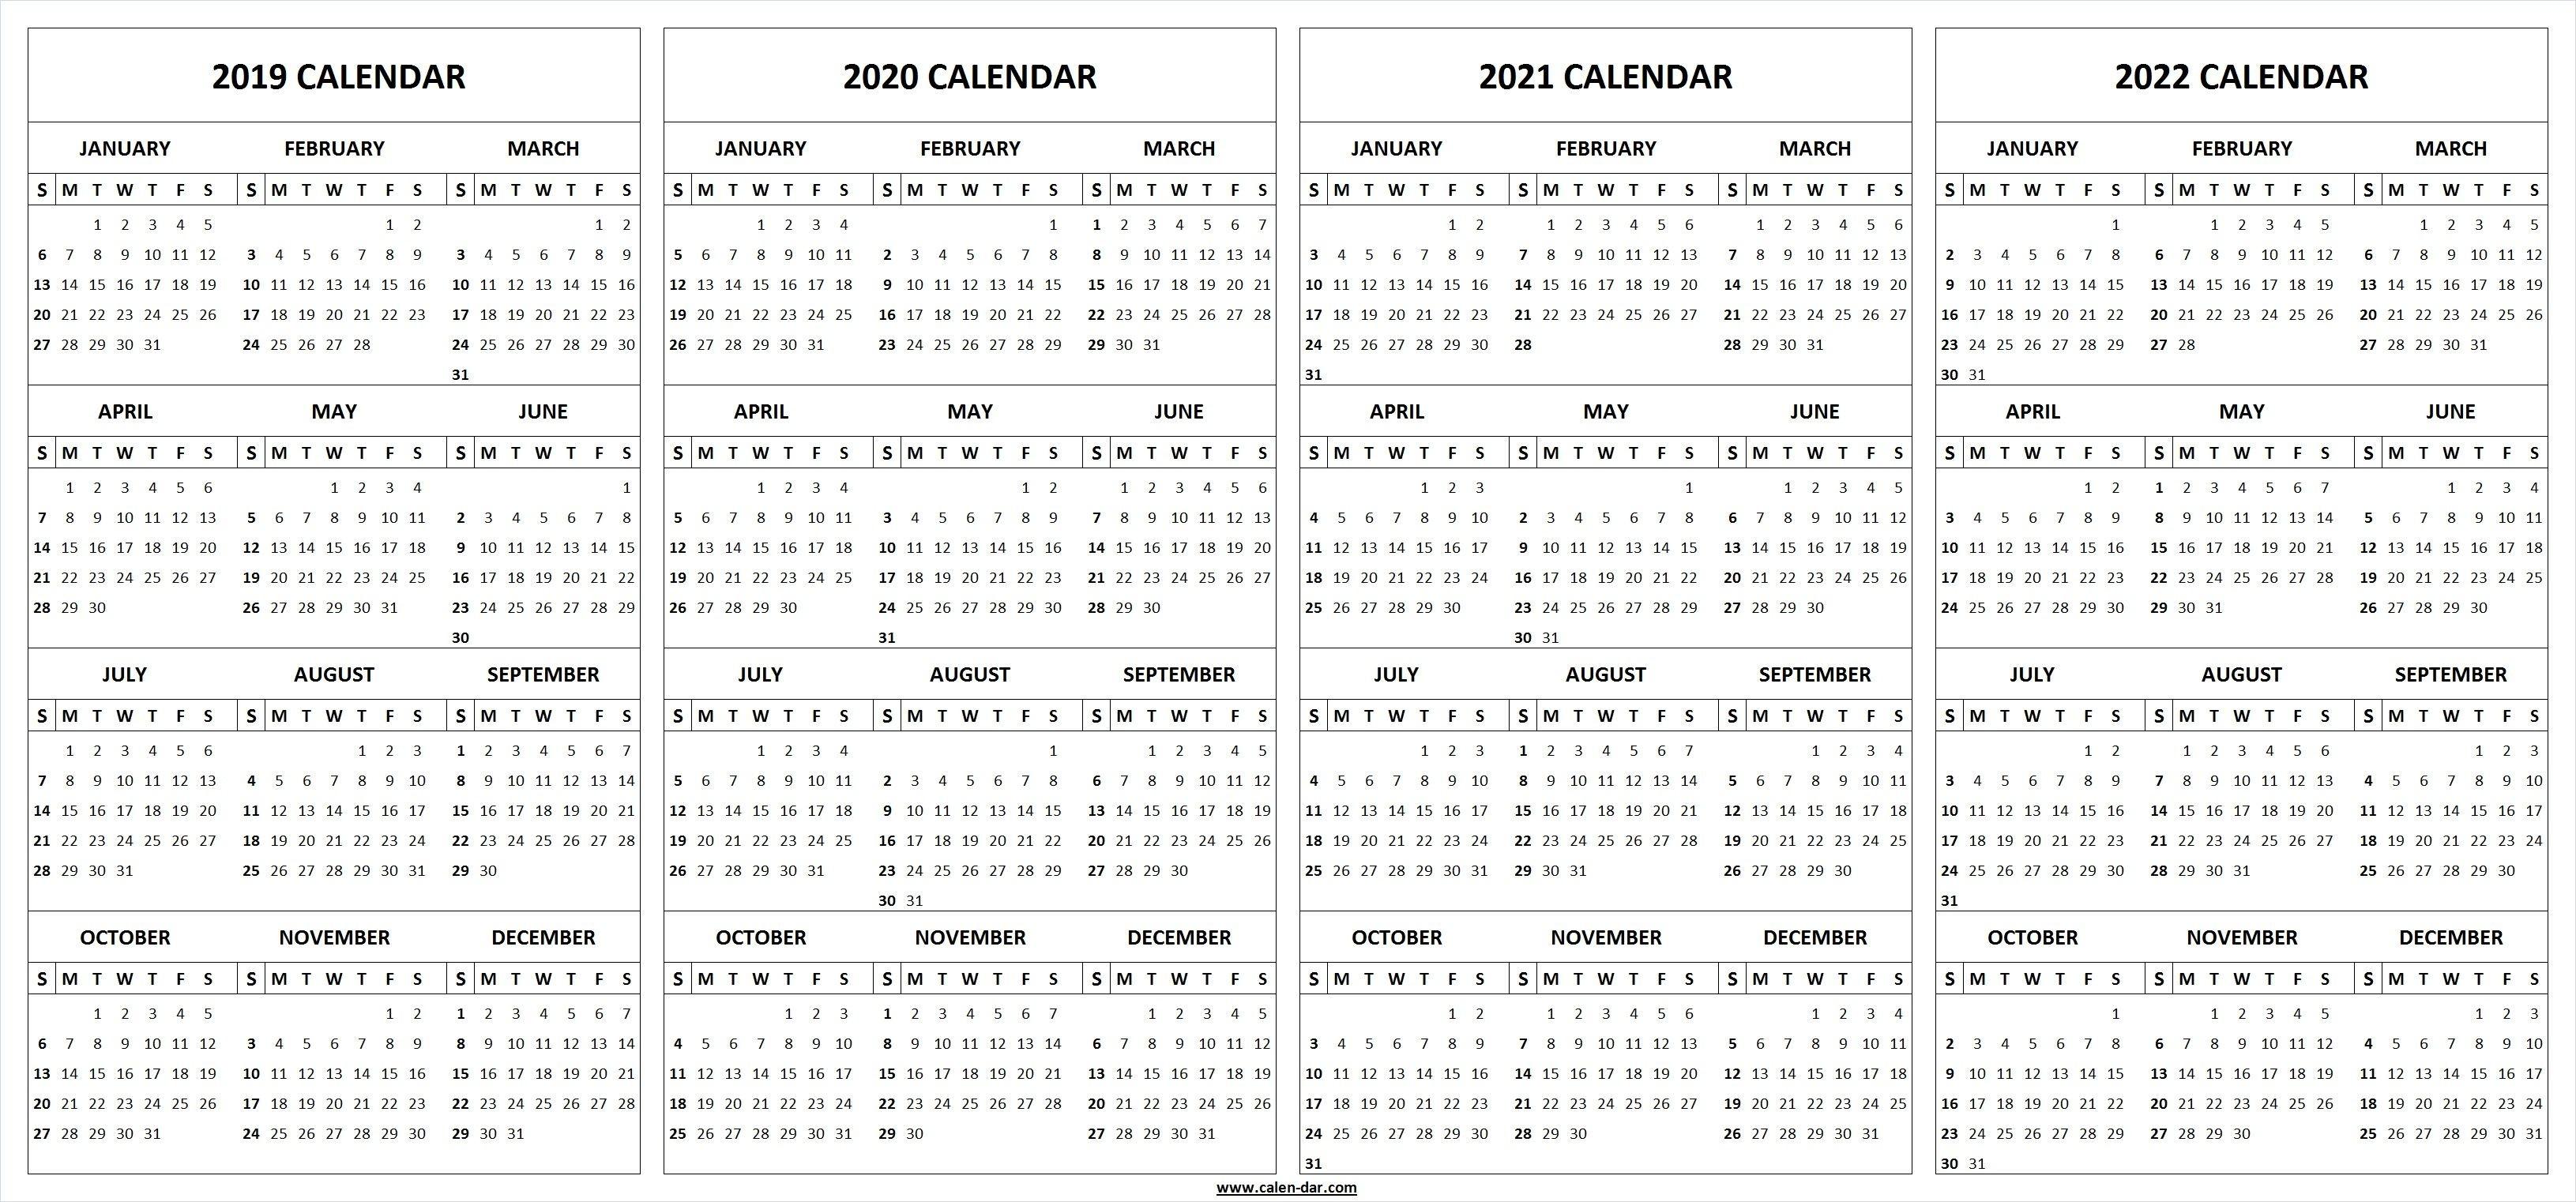 2019 2020 2021 2022 Calendar Blank Template | Calendar-Microsoft Calendar Templates 2020